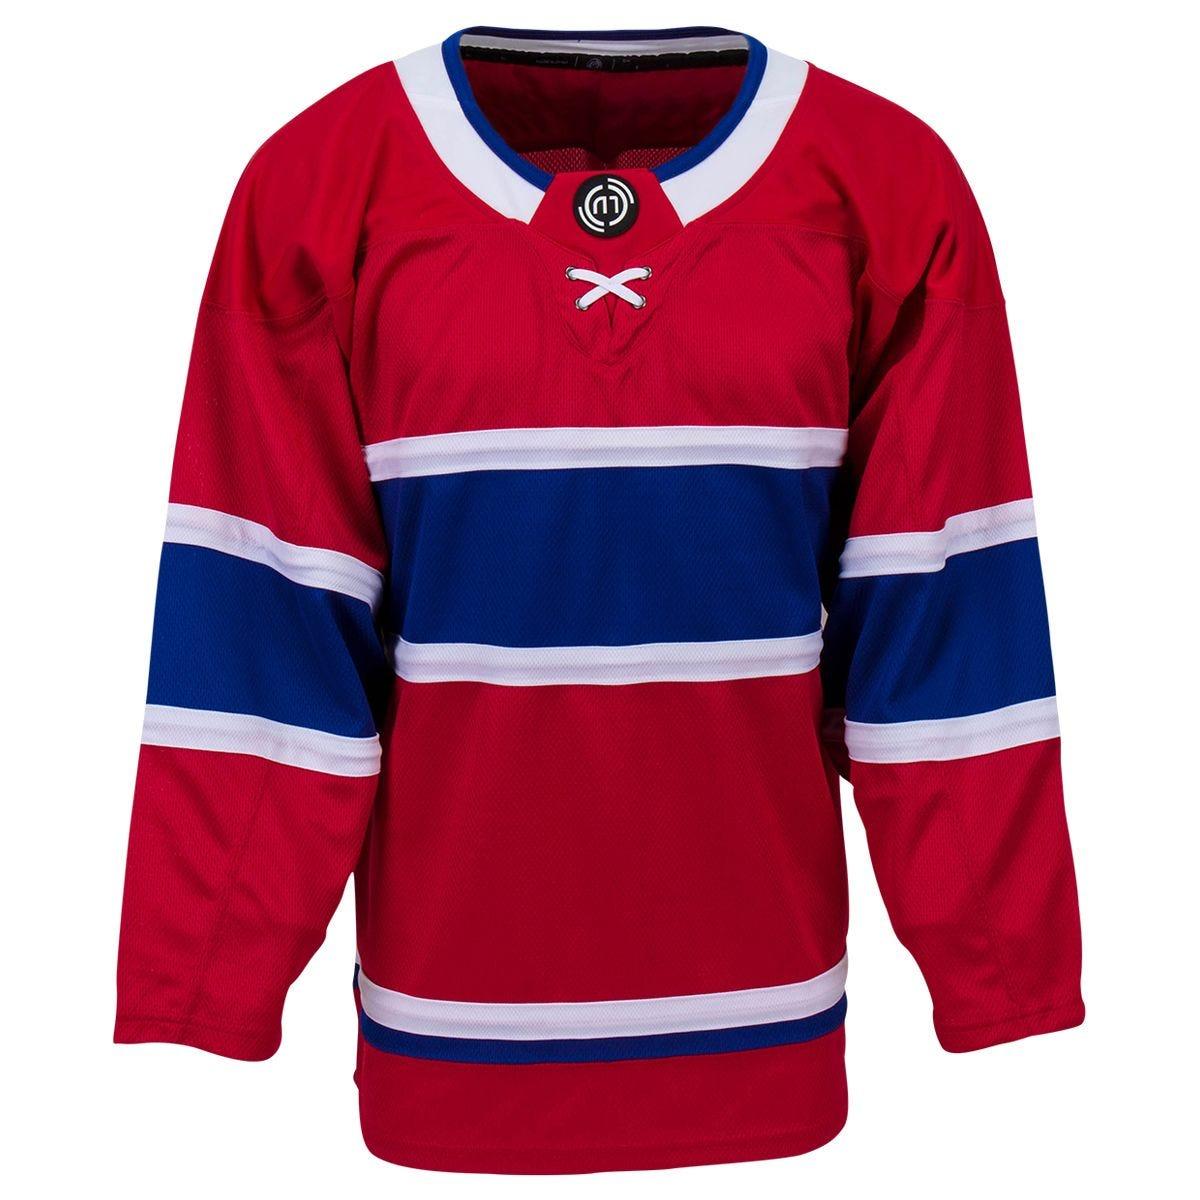 https://www.goaliemonkey.com/media/catalog/product/cache/a848536da192a0c5bb969d0898e6ec13/m/o/monkeysports-hockey-jersey-uncrested-montreal-canadiens-sr-inset6.jpg